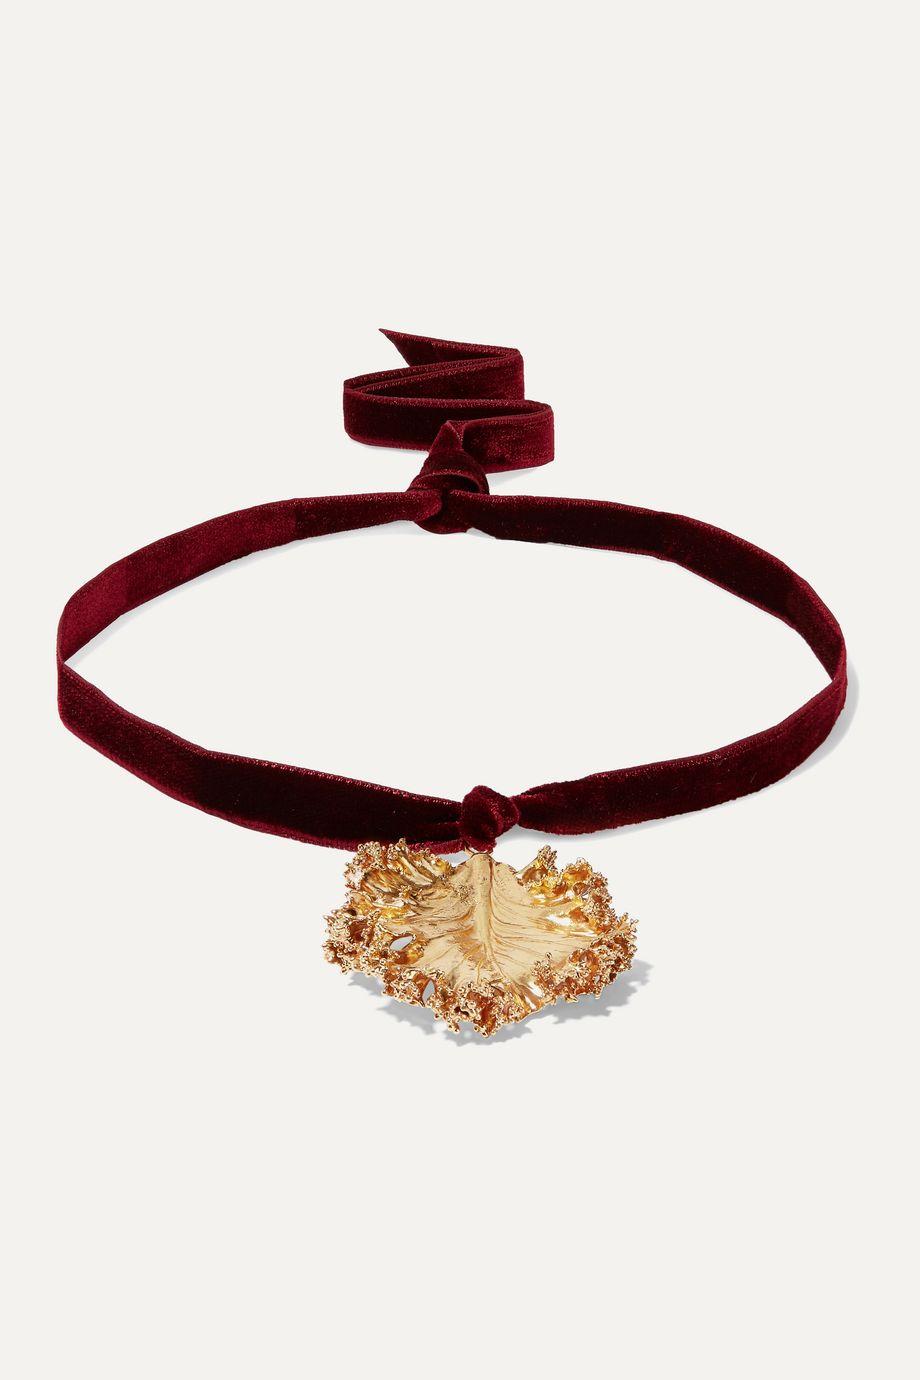 Ranjana Khan Gold-plated and velvet necklace